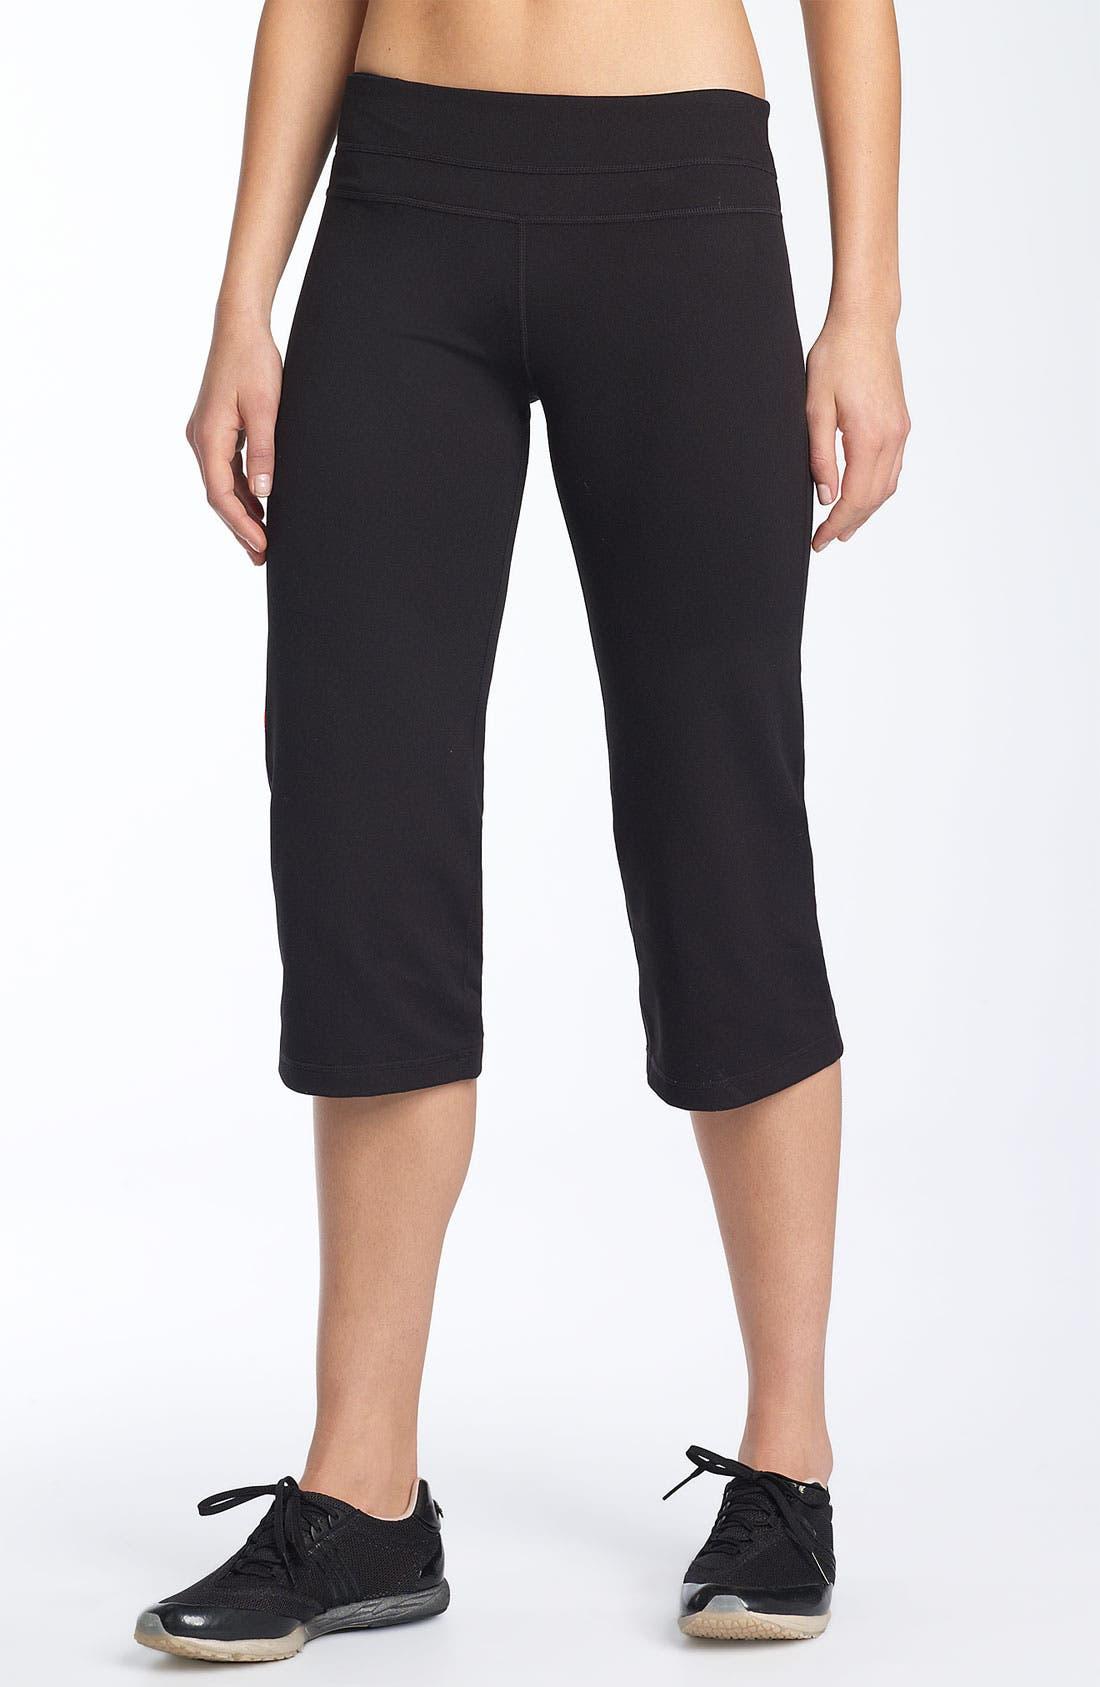 Alternate Image 1 Selected - Zella 'Booty' Capri Pants